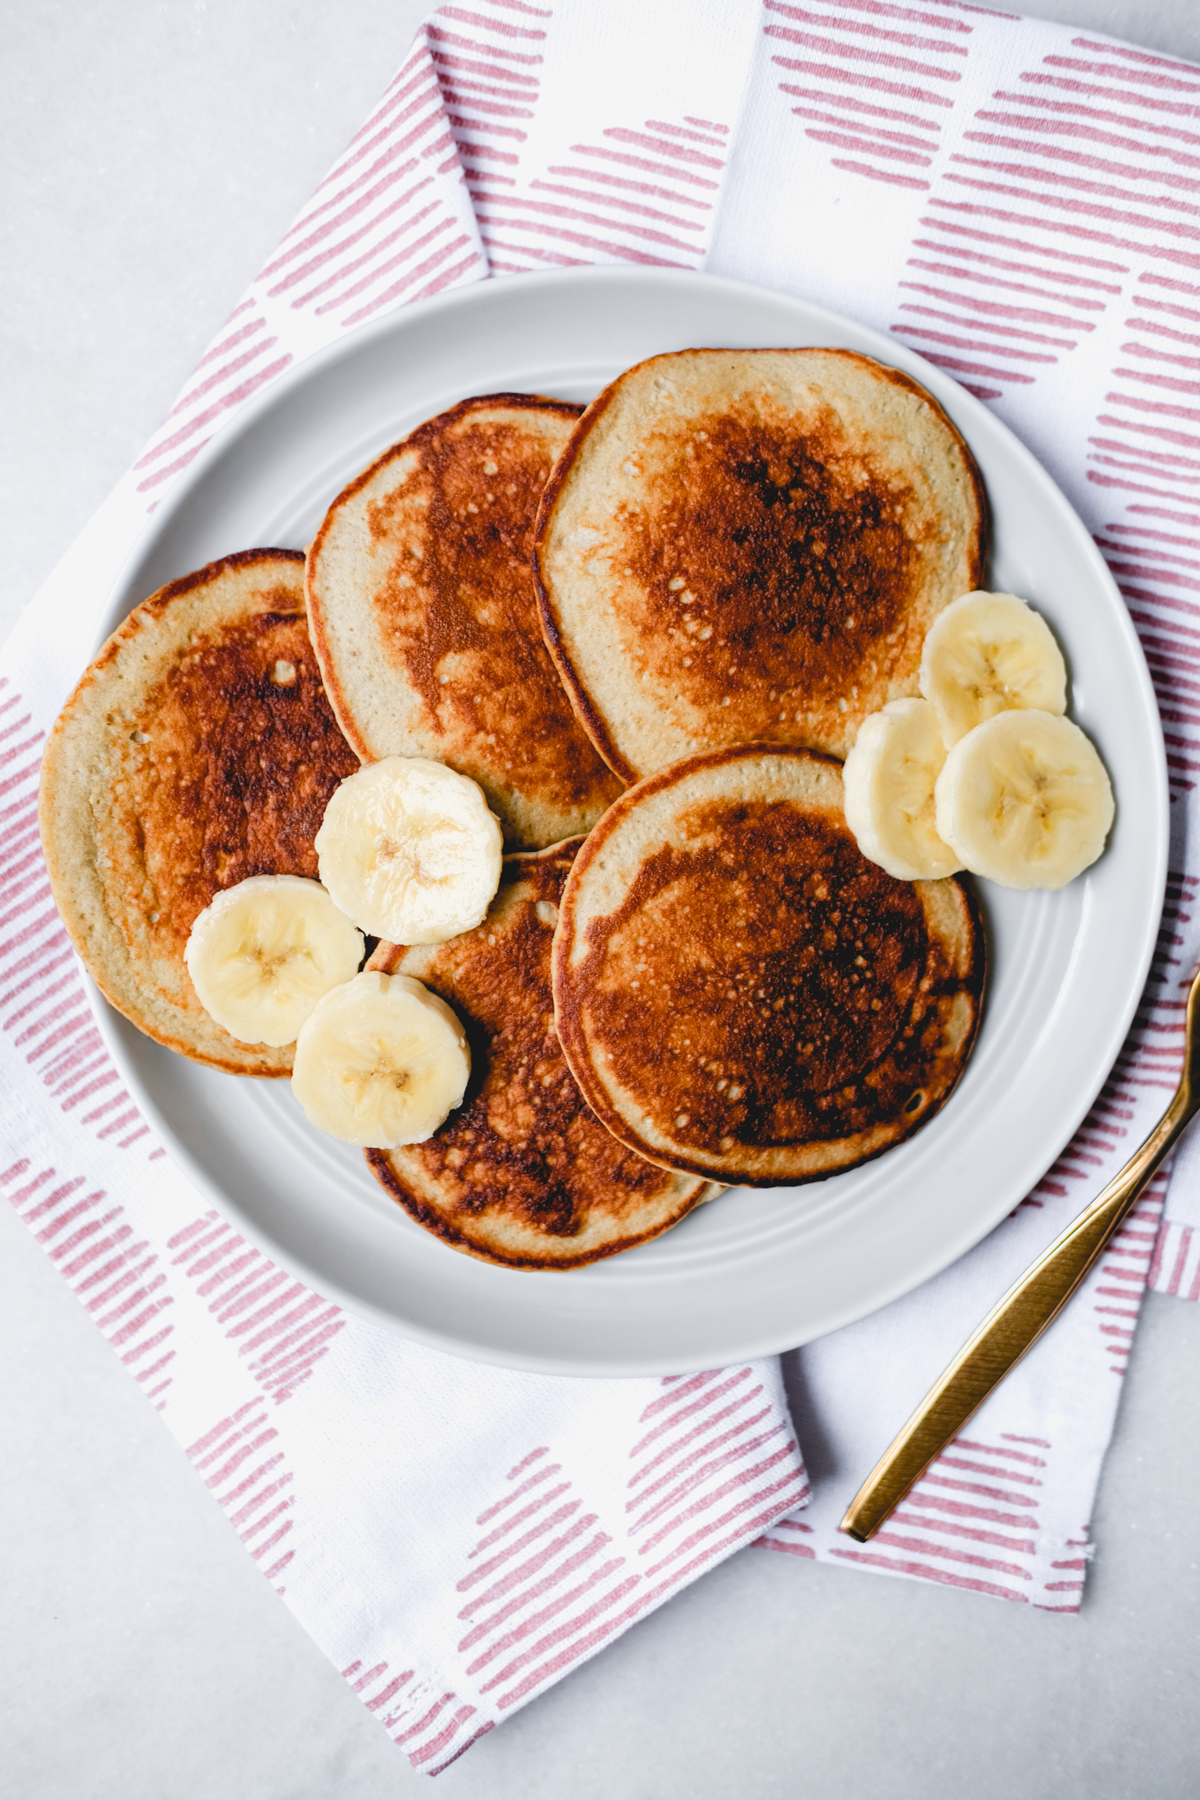 banana oatmeal pancakes with banana slices on a grey plate